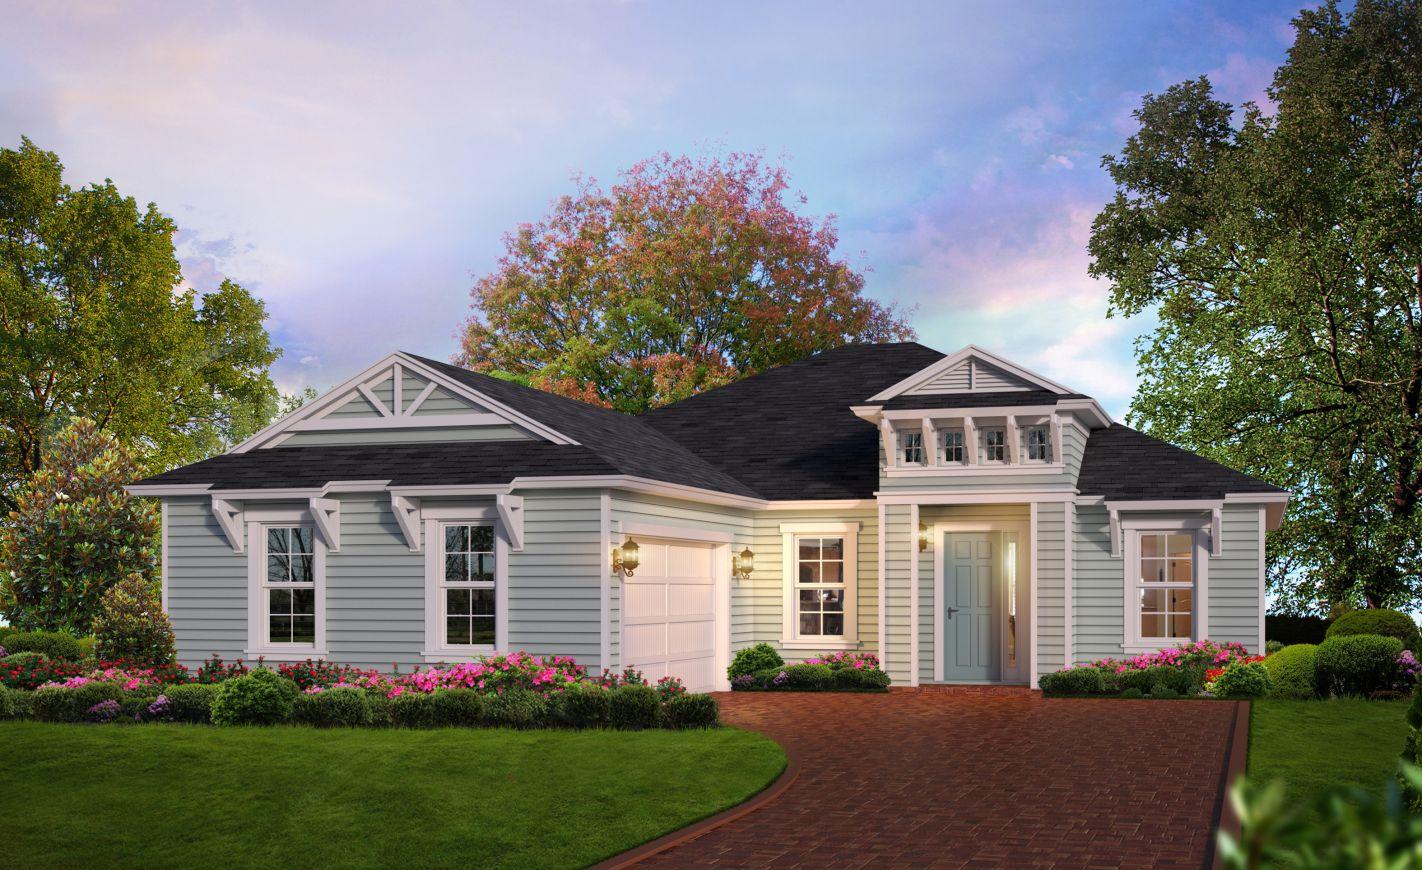 Fernandina Beach Homes for Sale - The Sophia at Amelia National